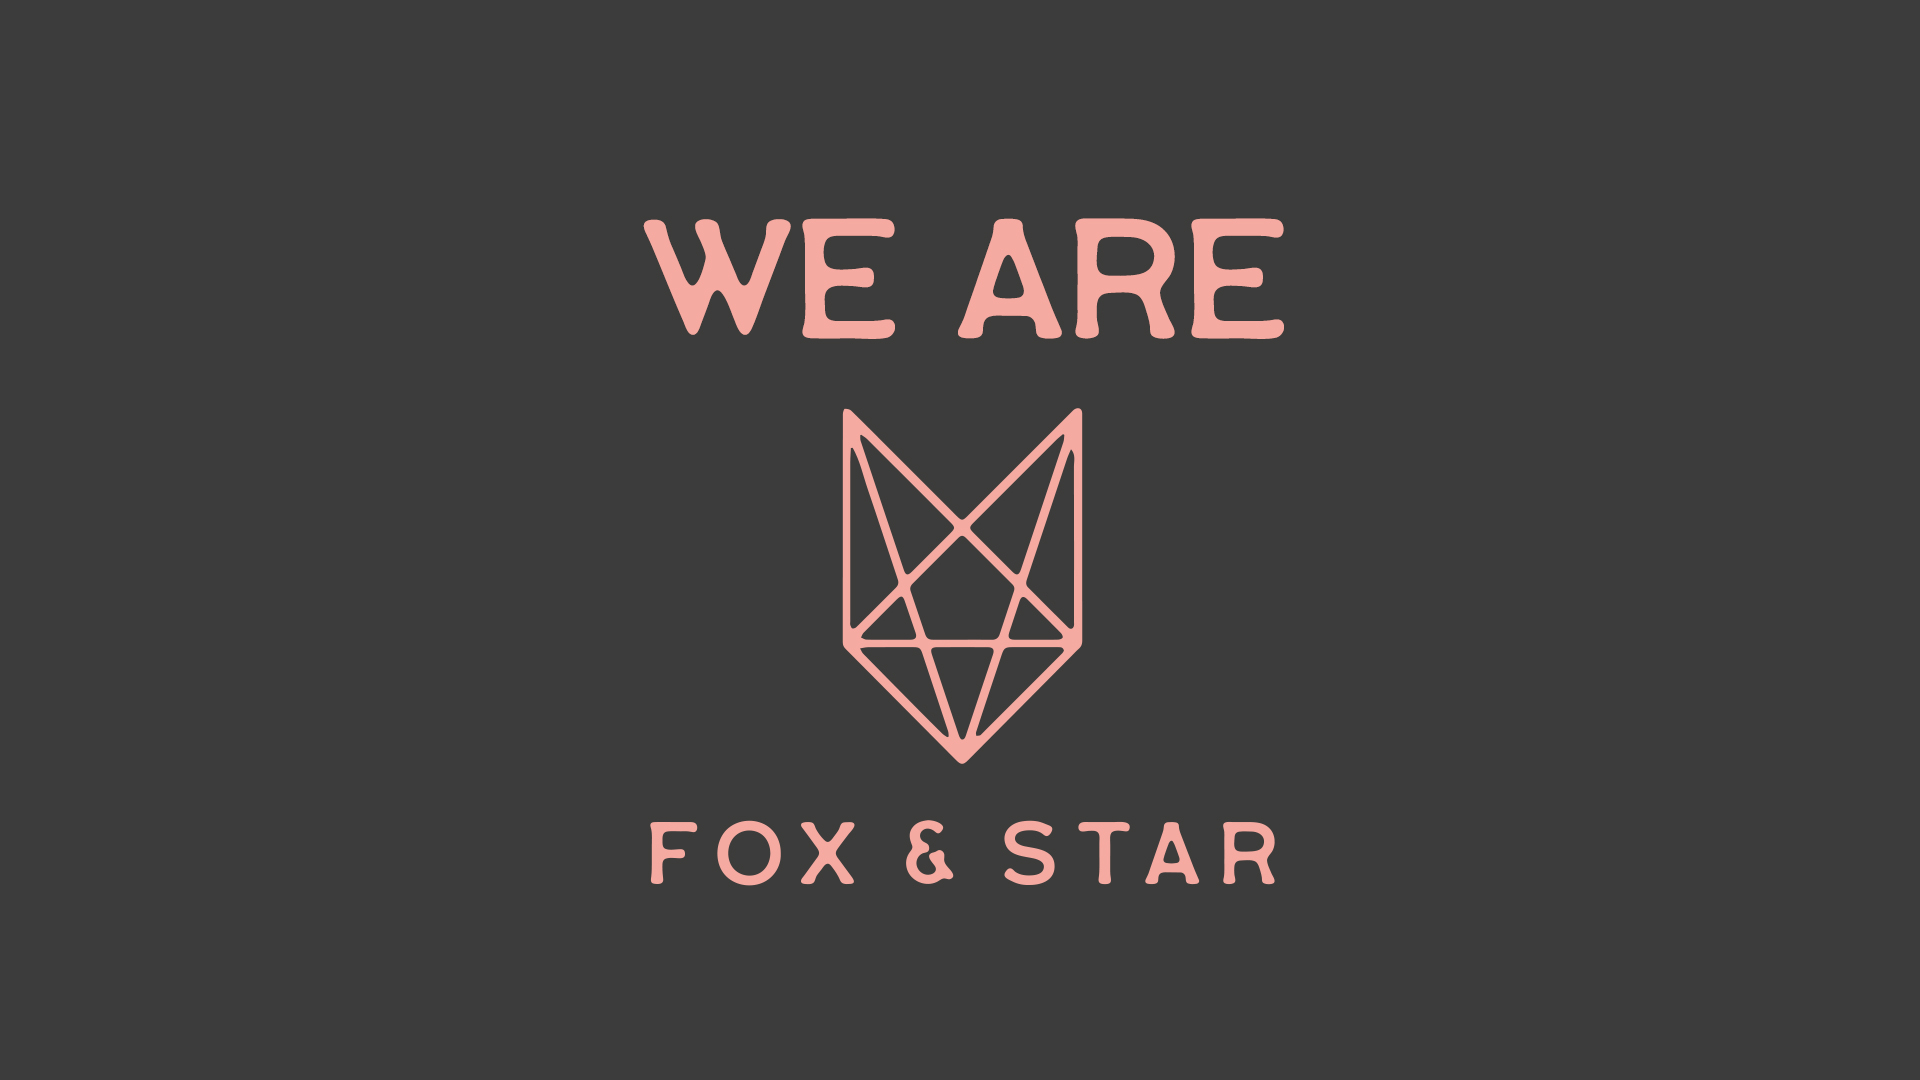 Fox & Star Marketing